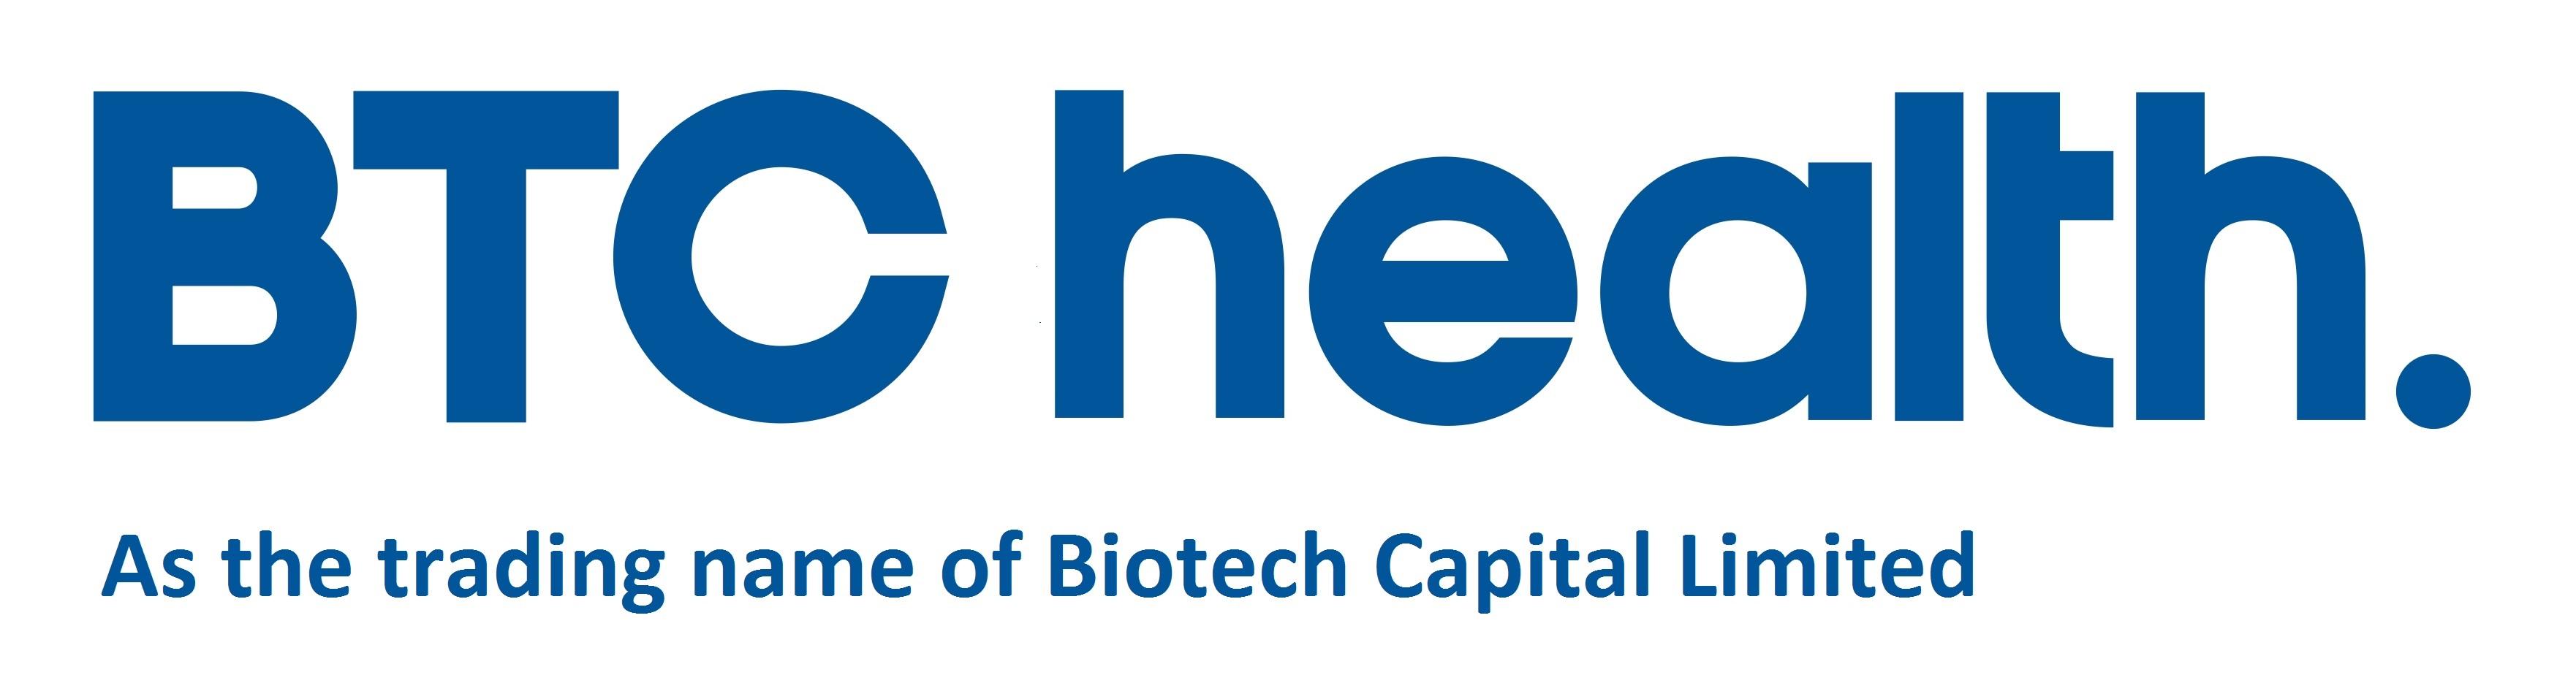 Biotech Capital Limited Logo